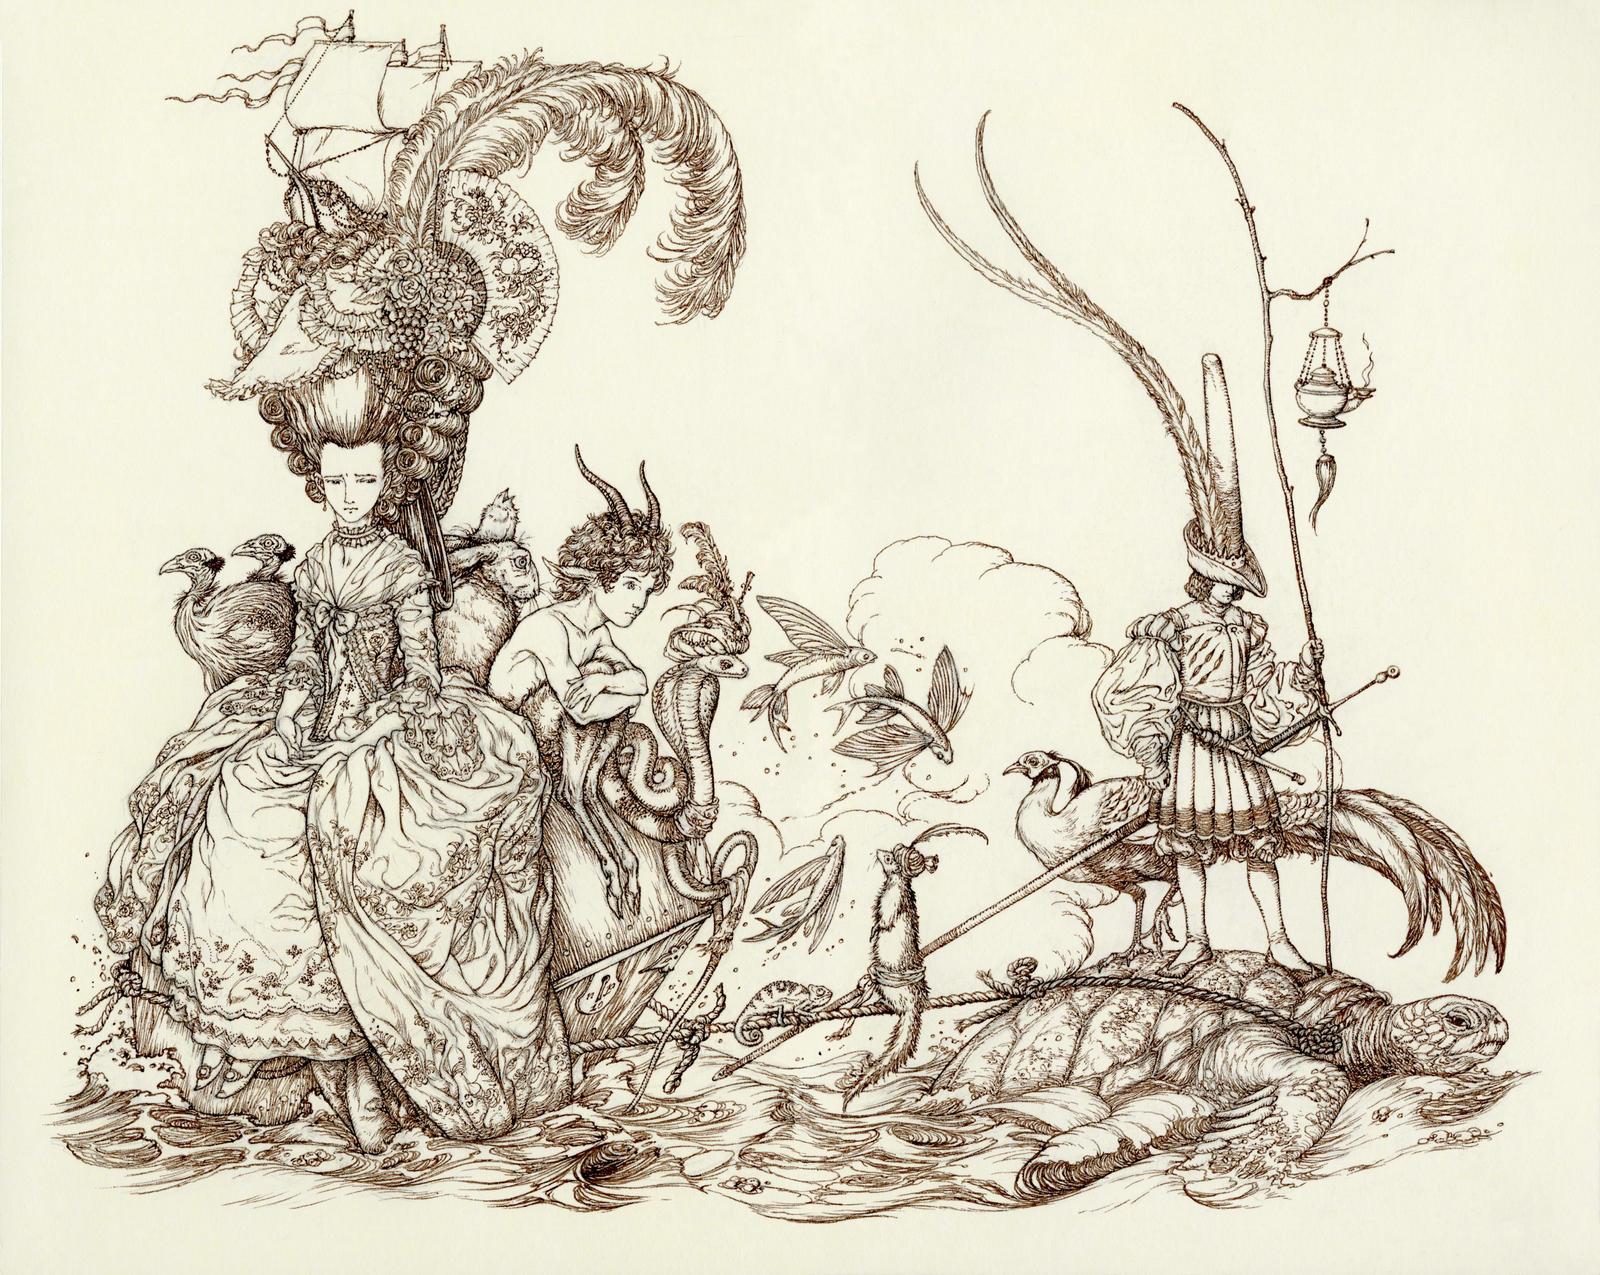 Adrift by Himmapaan